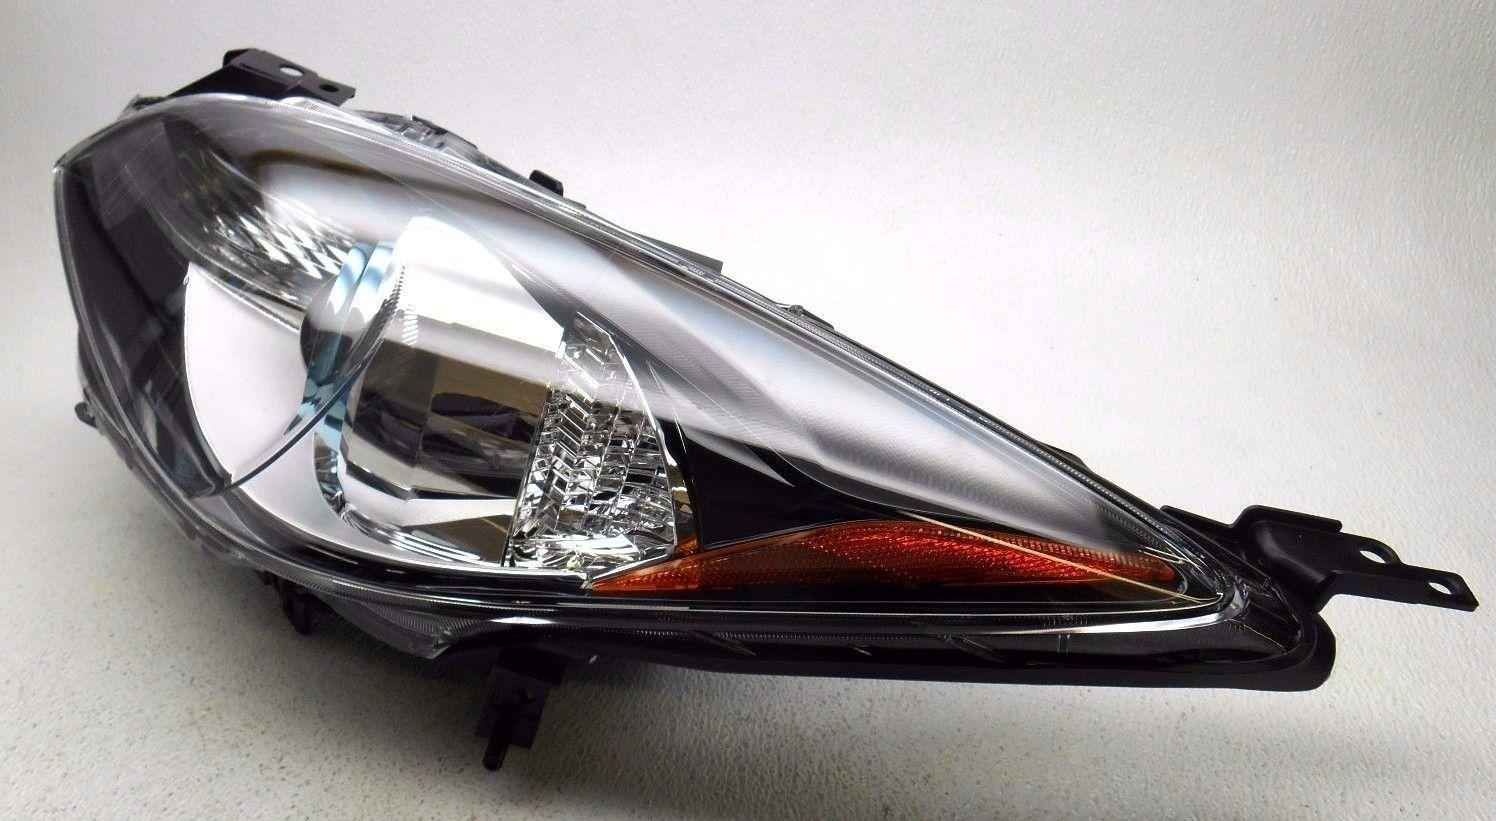 new oem 2012 2013 mazda 3 left xenon headlamp blue. Black Bedroom Furniture Sets. Home Design Ideas